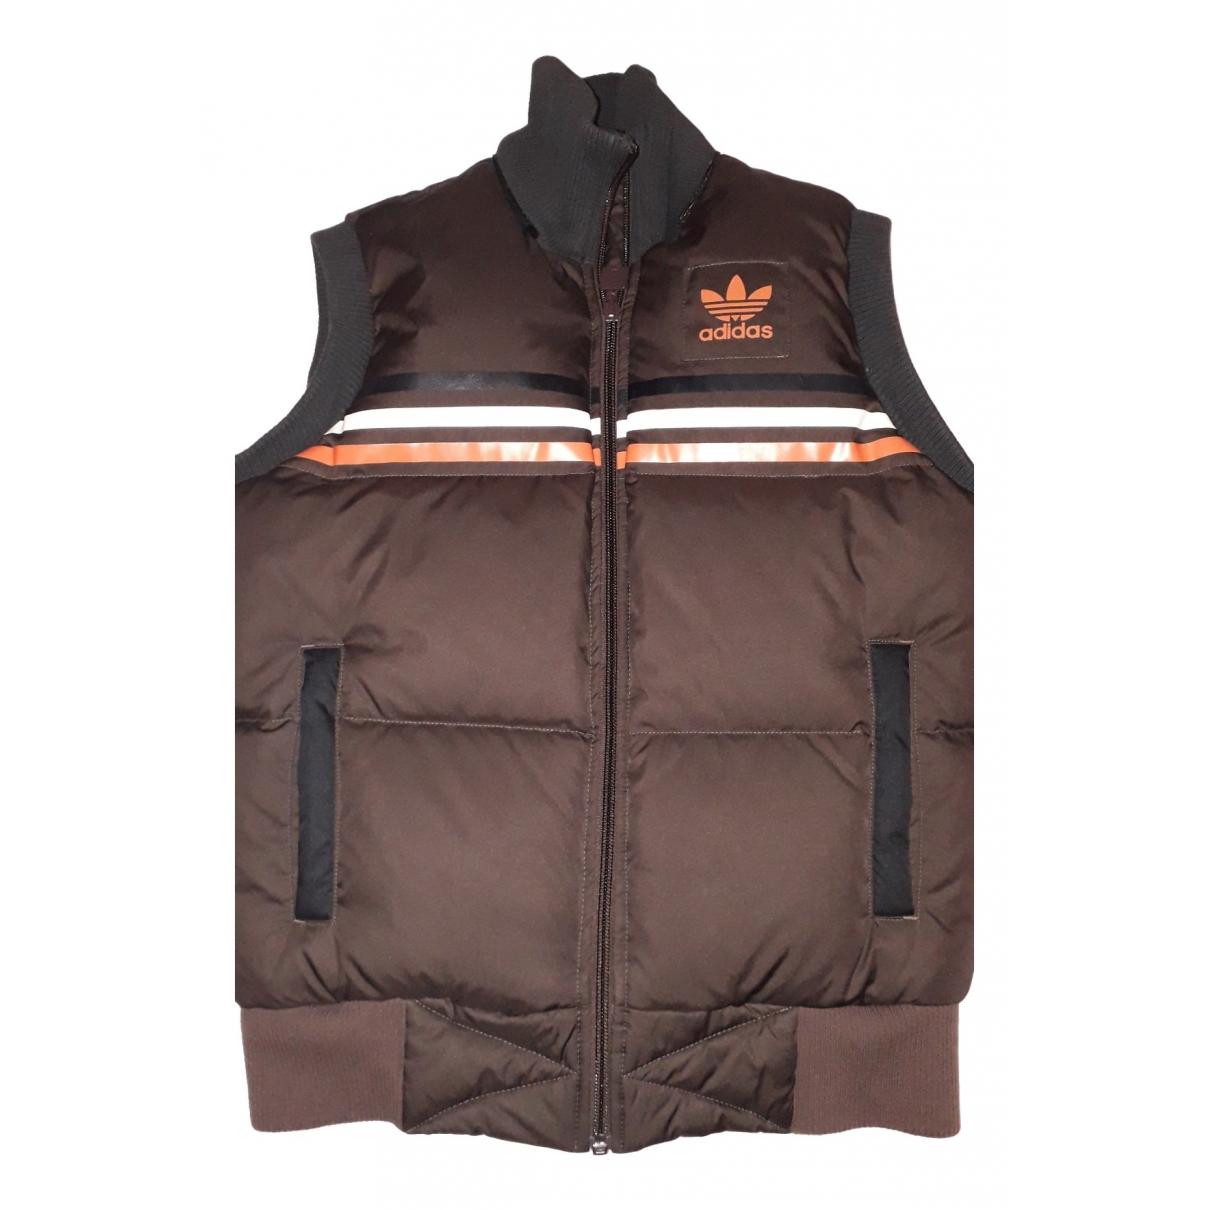 Adidas \N Brown jacket for Women M International